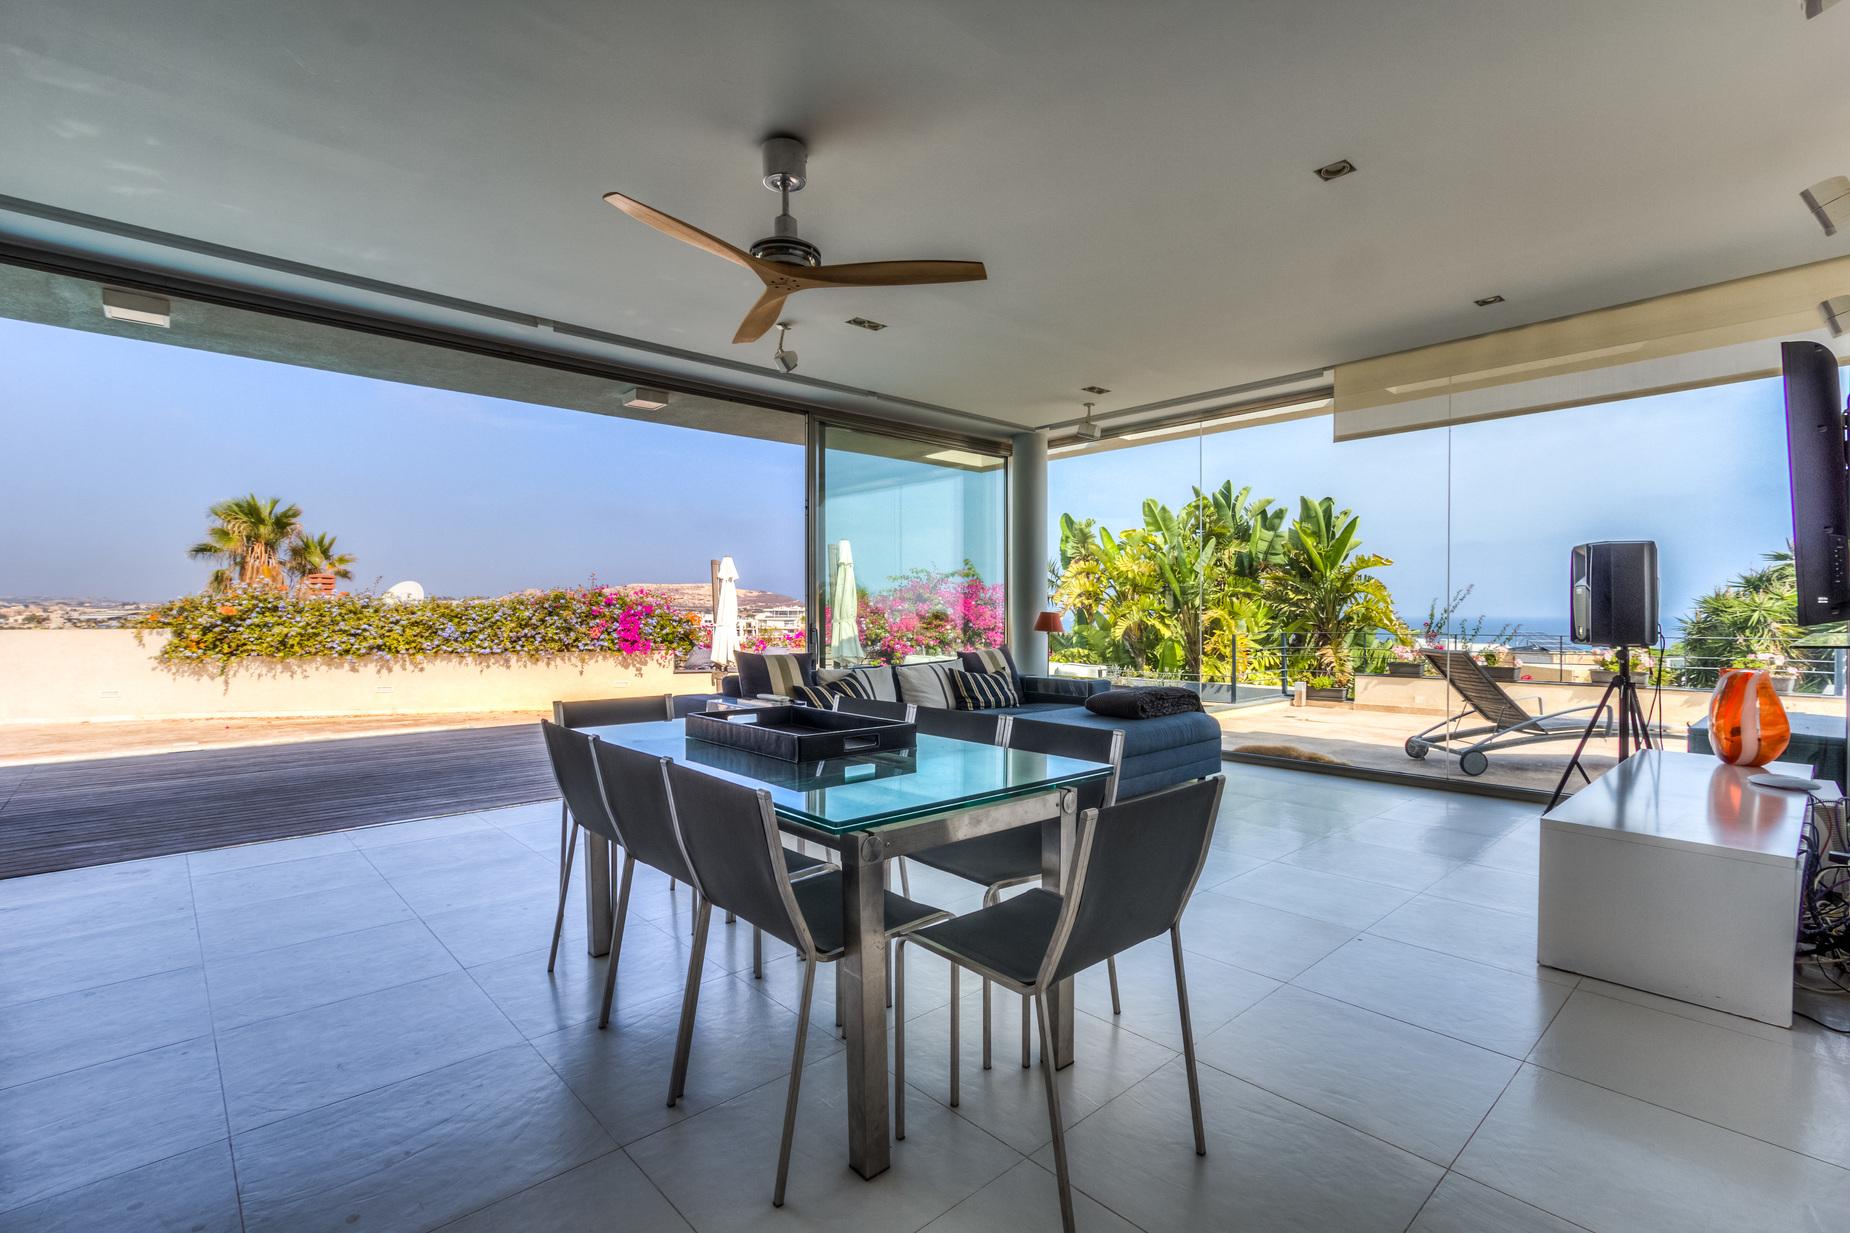 7 bed Villa For Sale in Bahar ic-Caghaq, Bahar ic-Caghaq - thumb 22